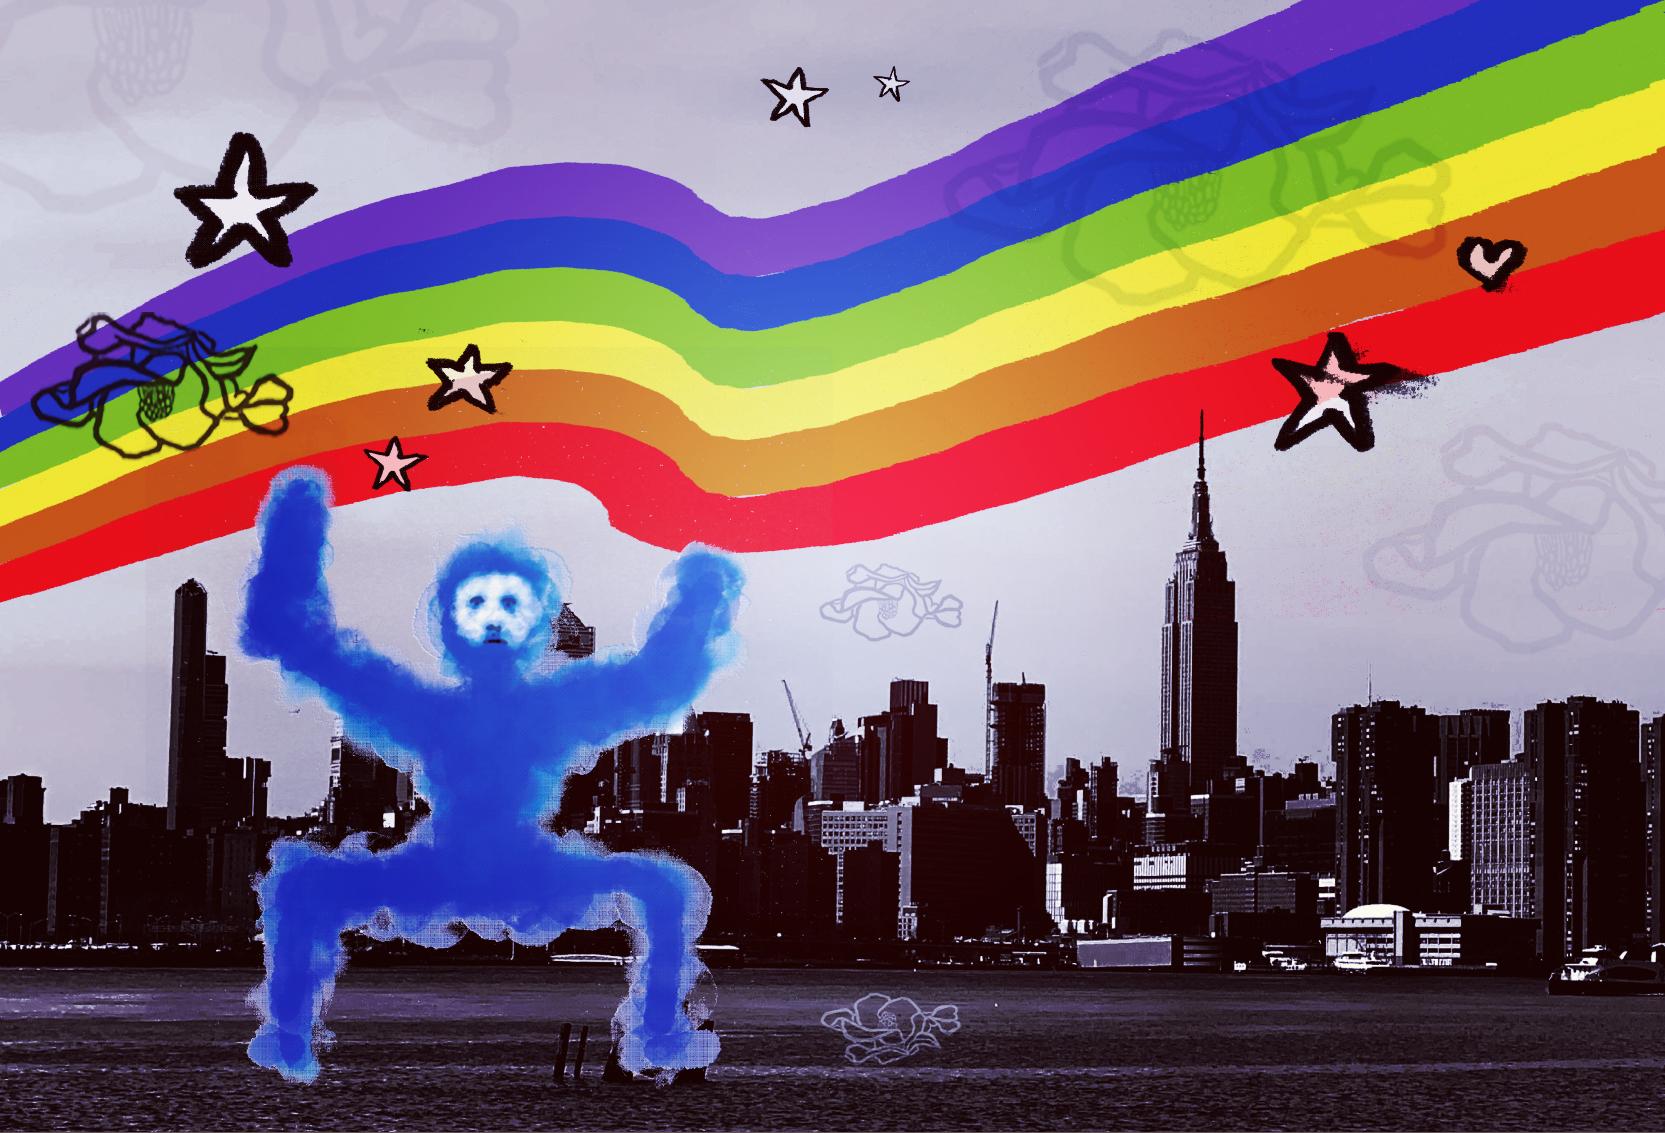 LGBTの一大イベント「プライド」に300万人が集結! カラフルに彩られたNYの街